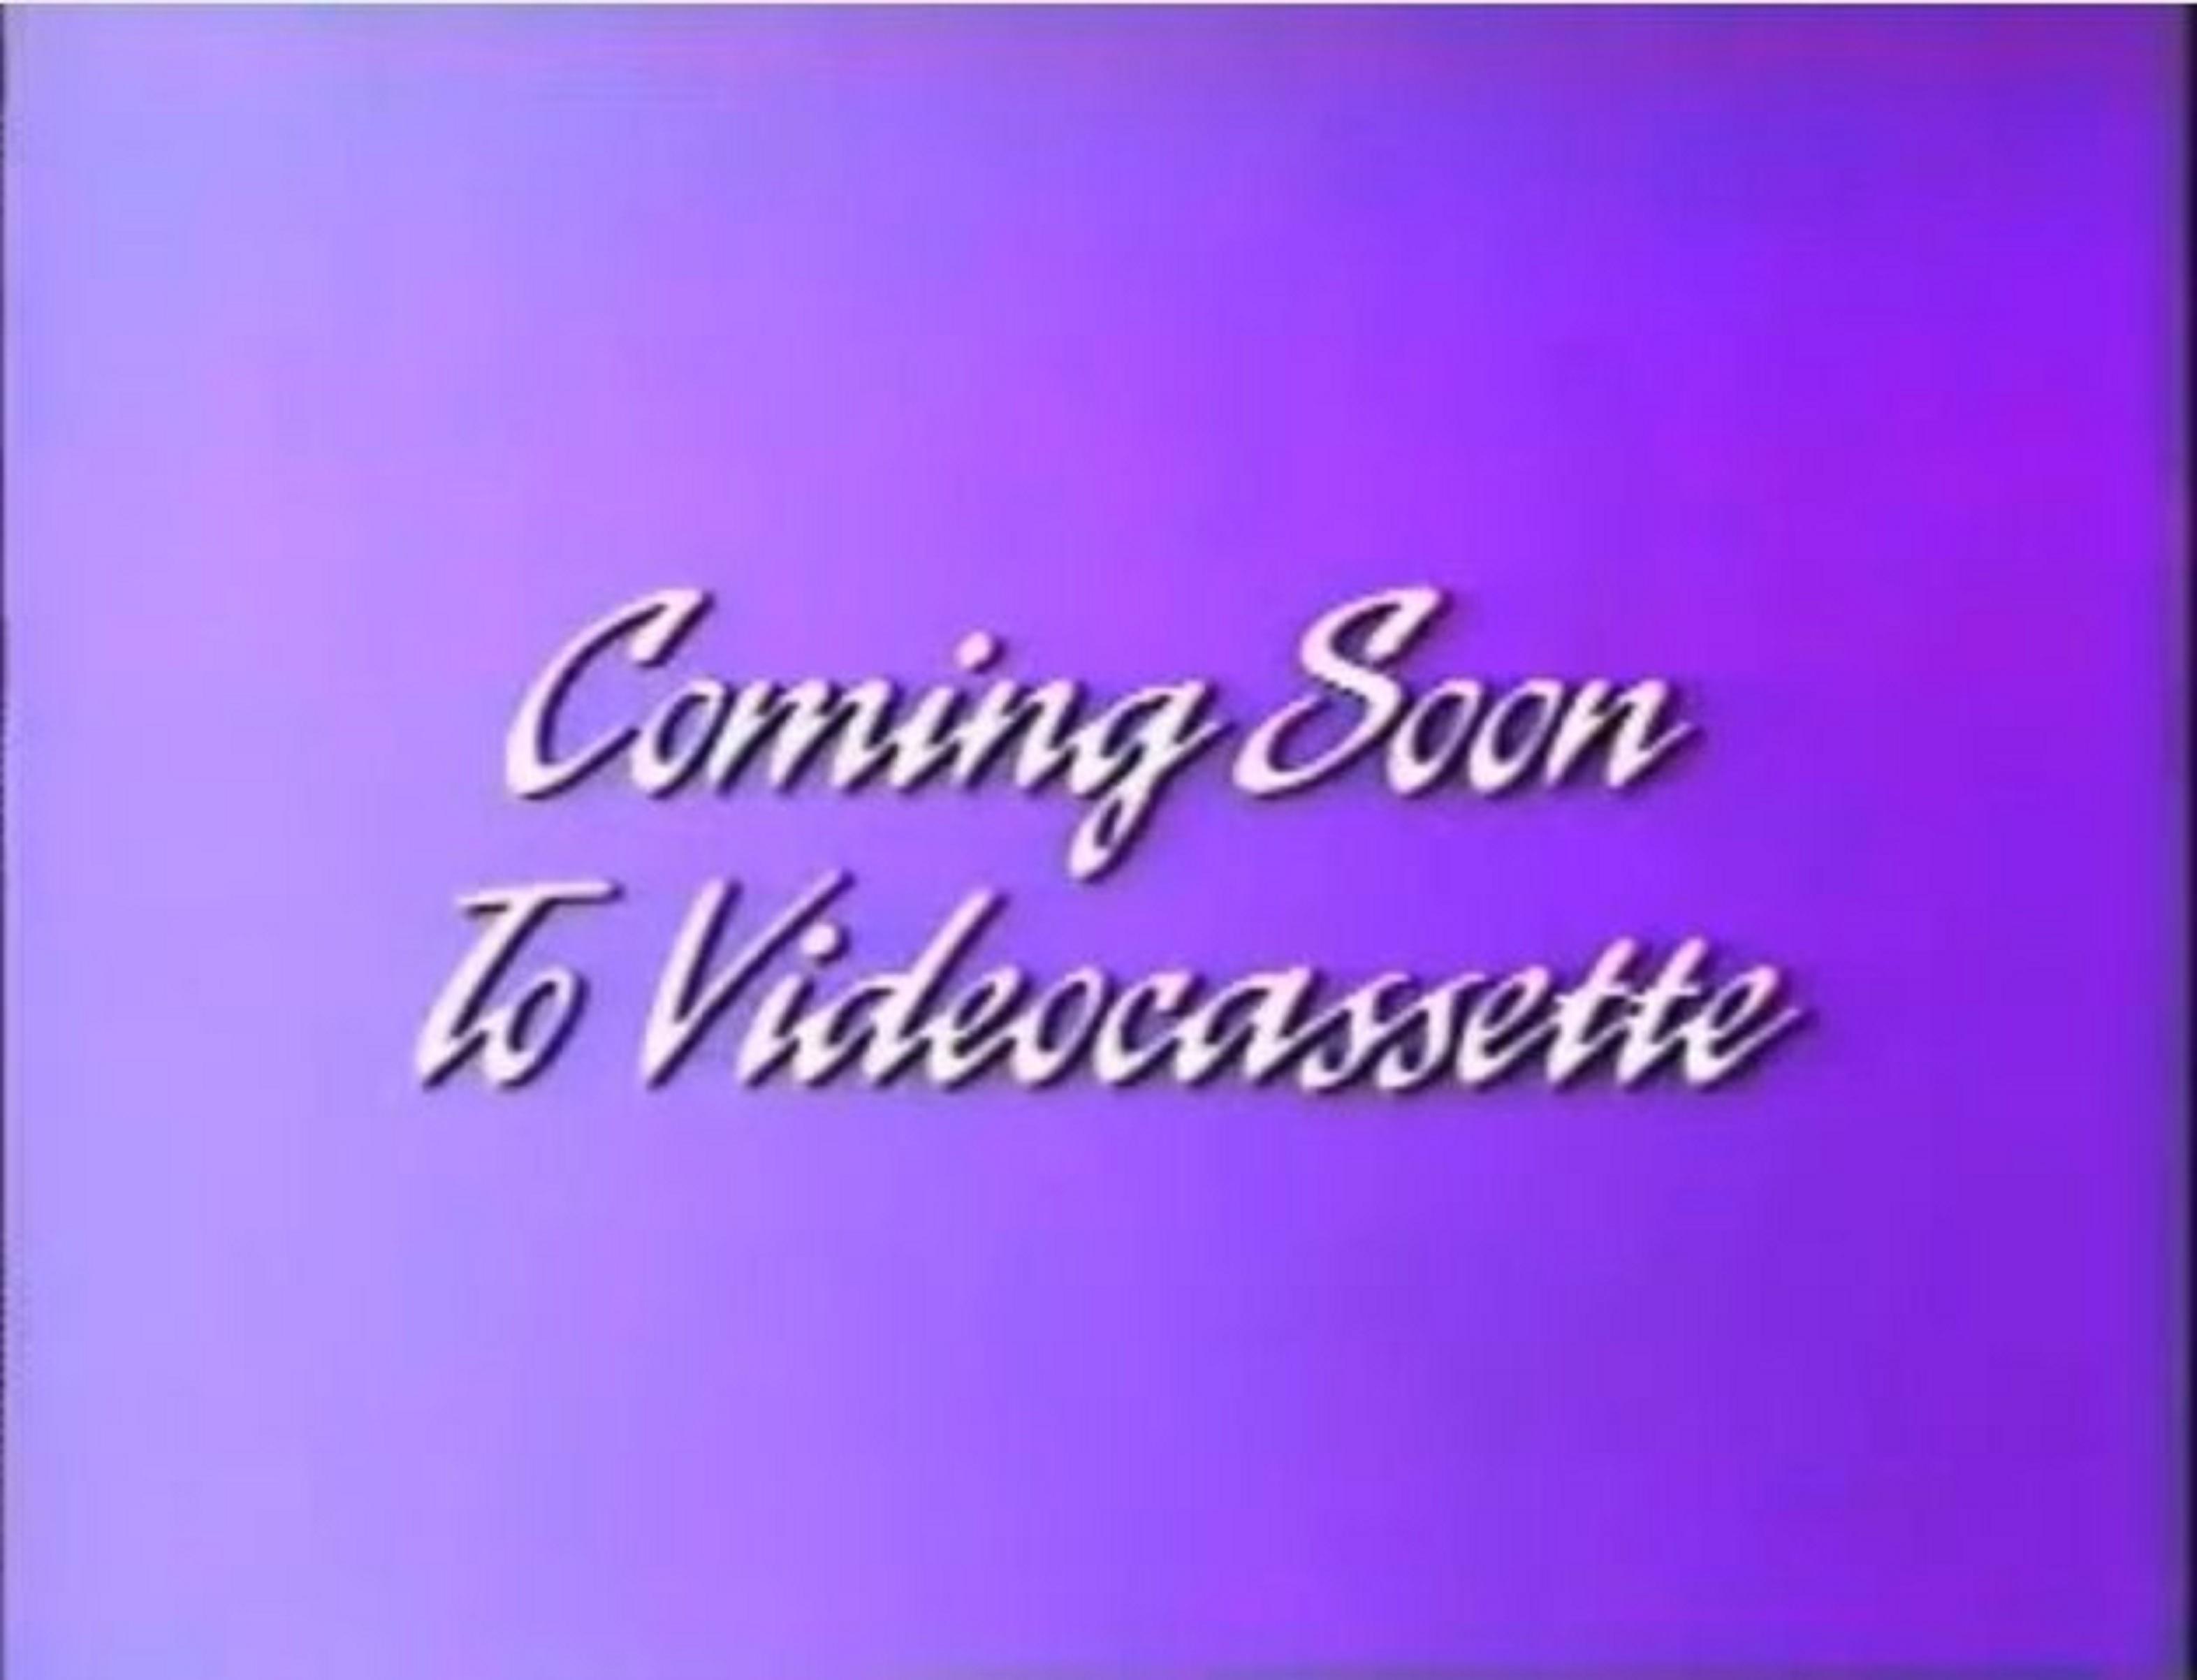 Walt Disney Studios Home Entertainment Buena Vista Coming Soon To Videocassette Logo 1995